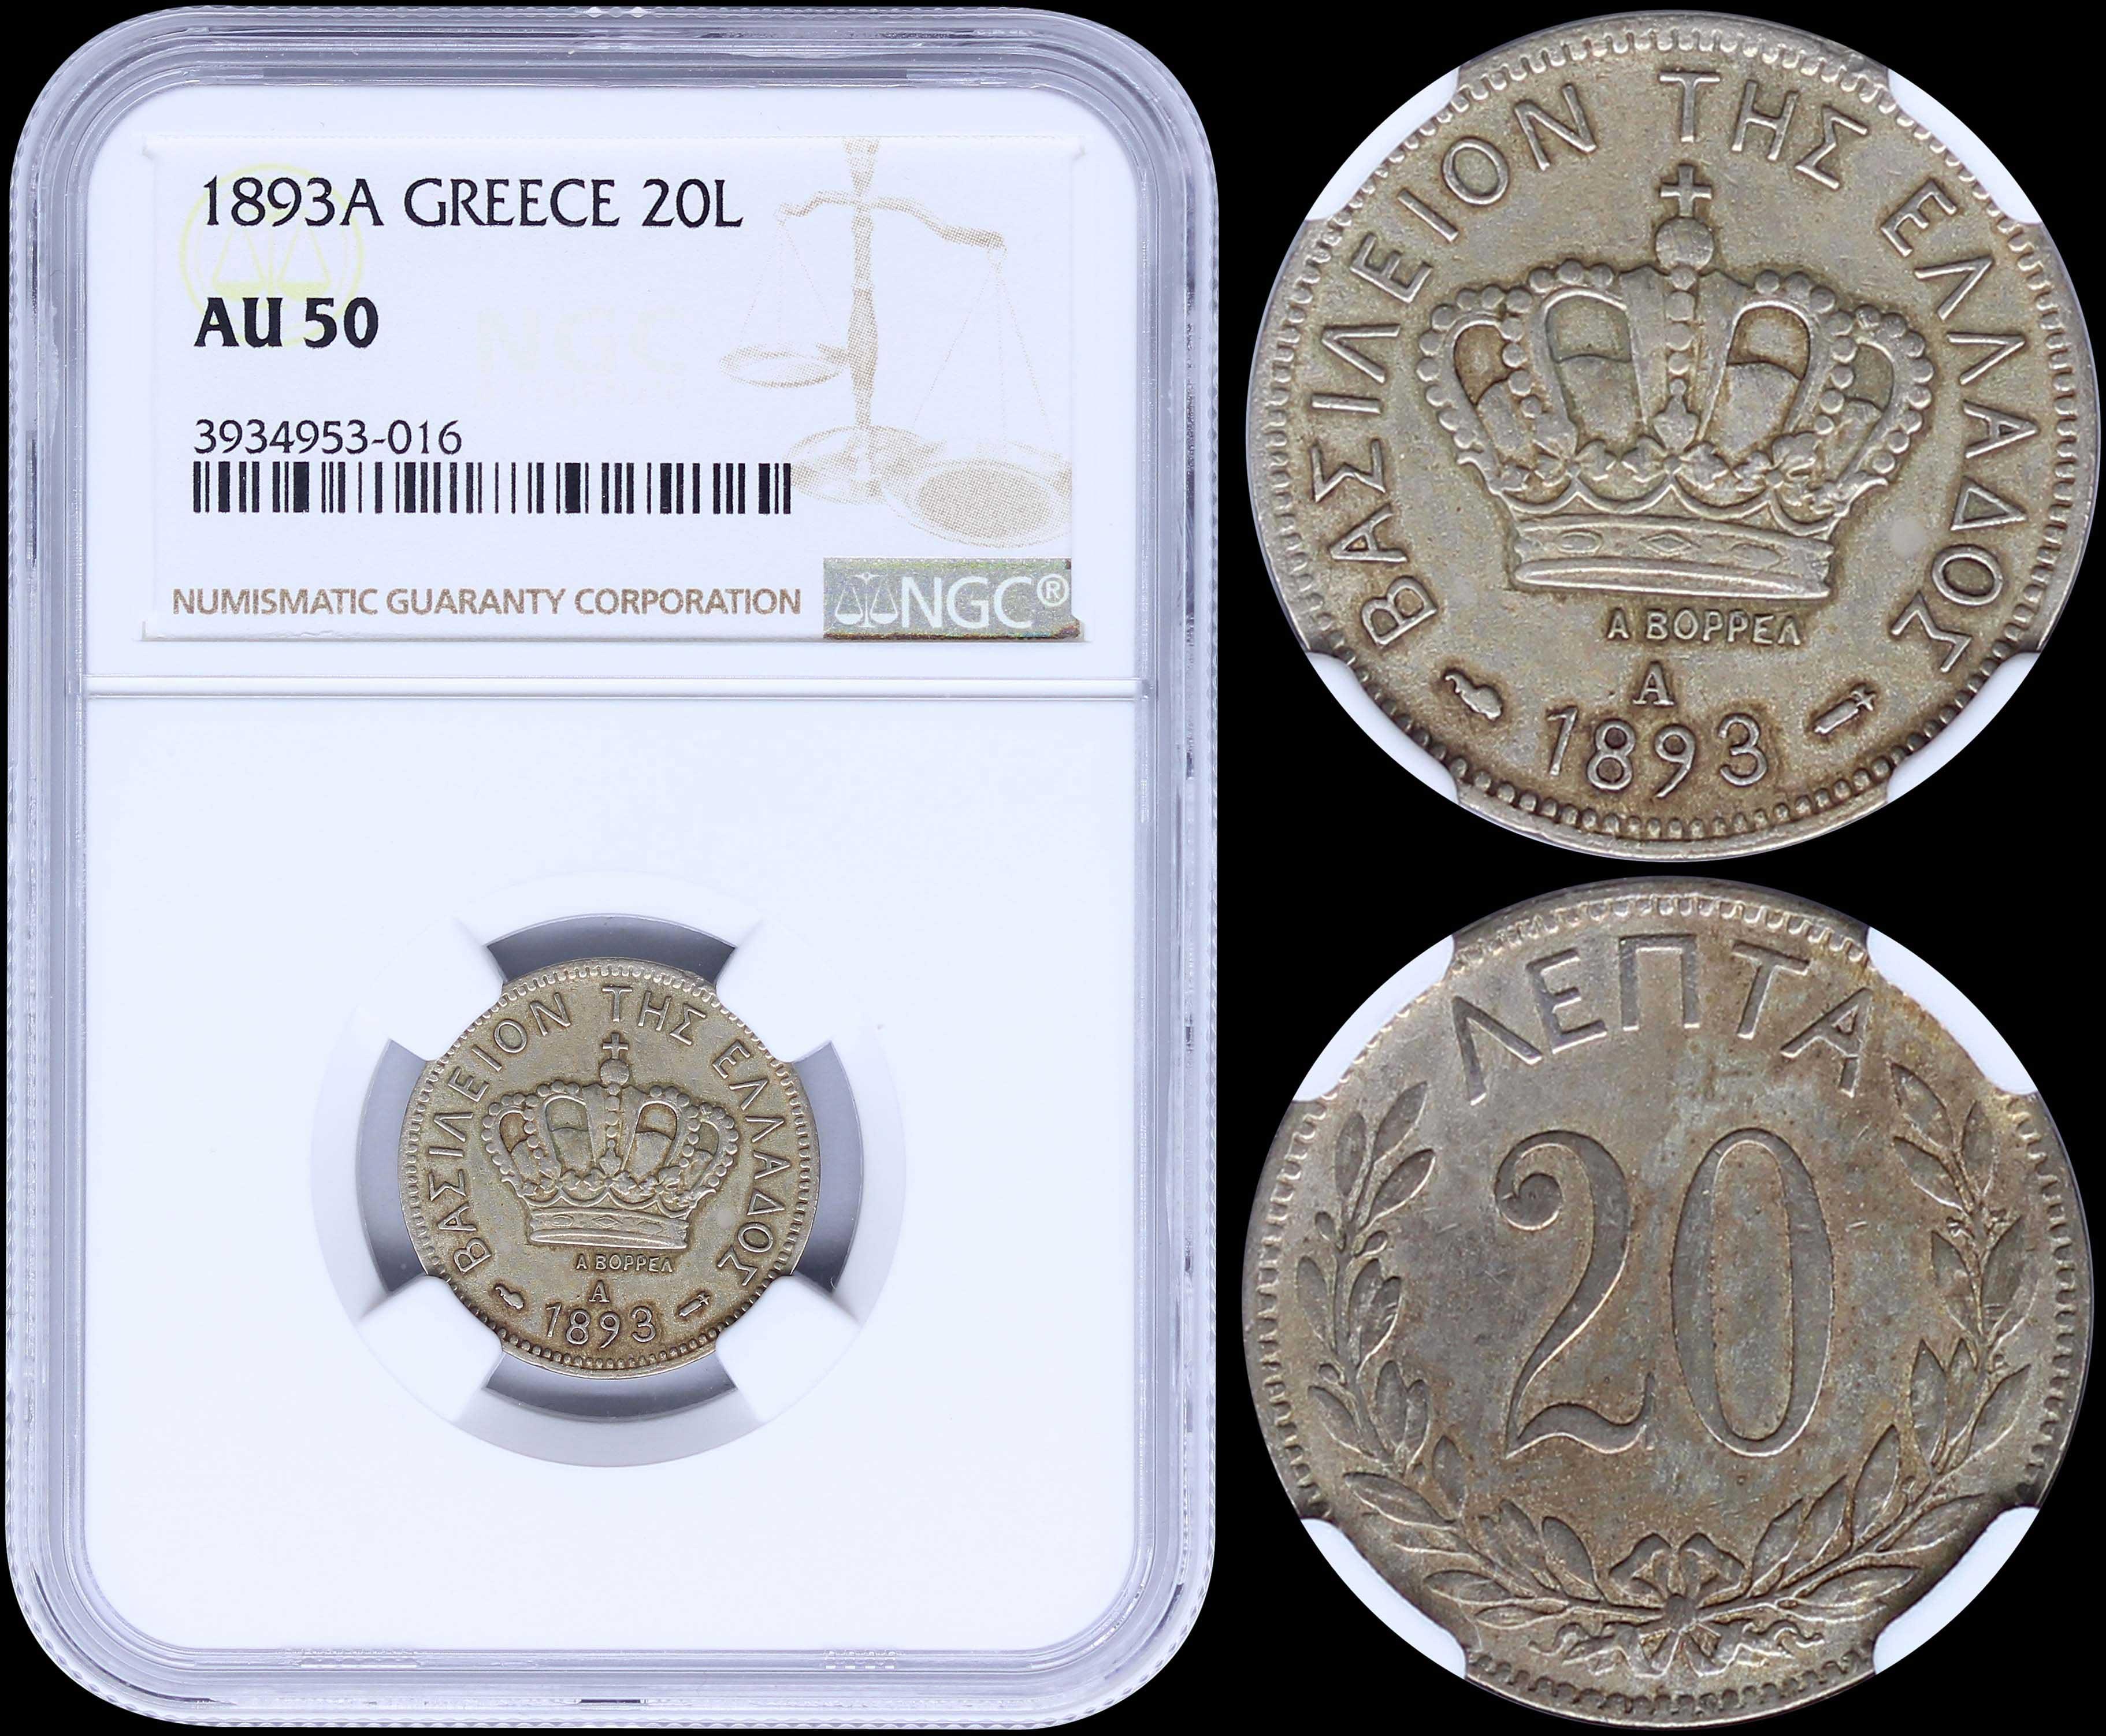 Lot 8149 - -  COINS & TOKENS king george i -  A. Karamitsos Public & Live Bid Auction 644 Coins, Medals & Banknotes